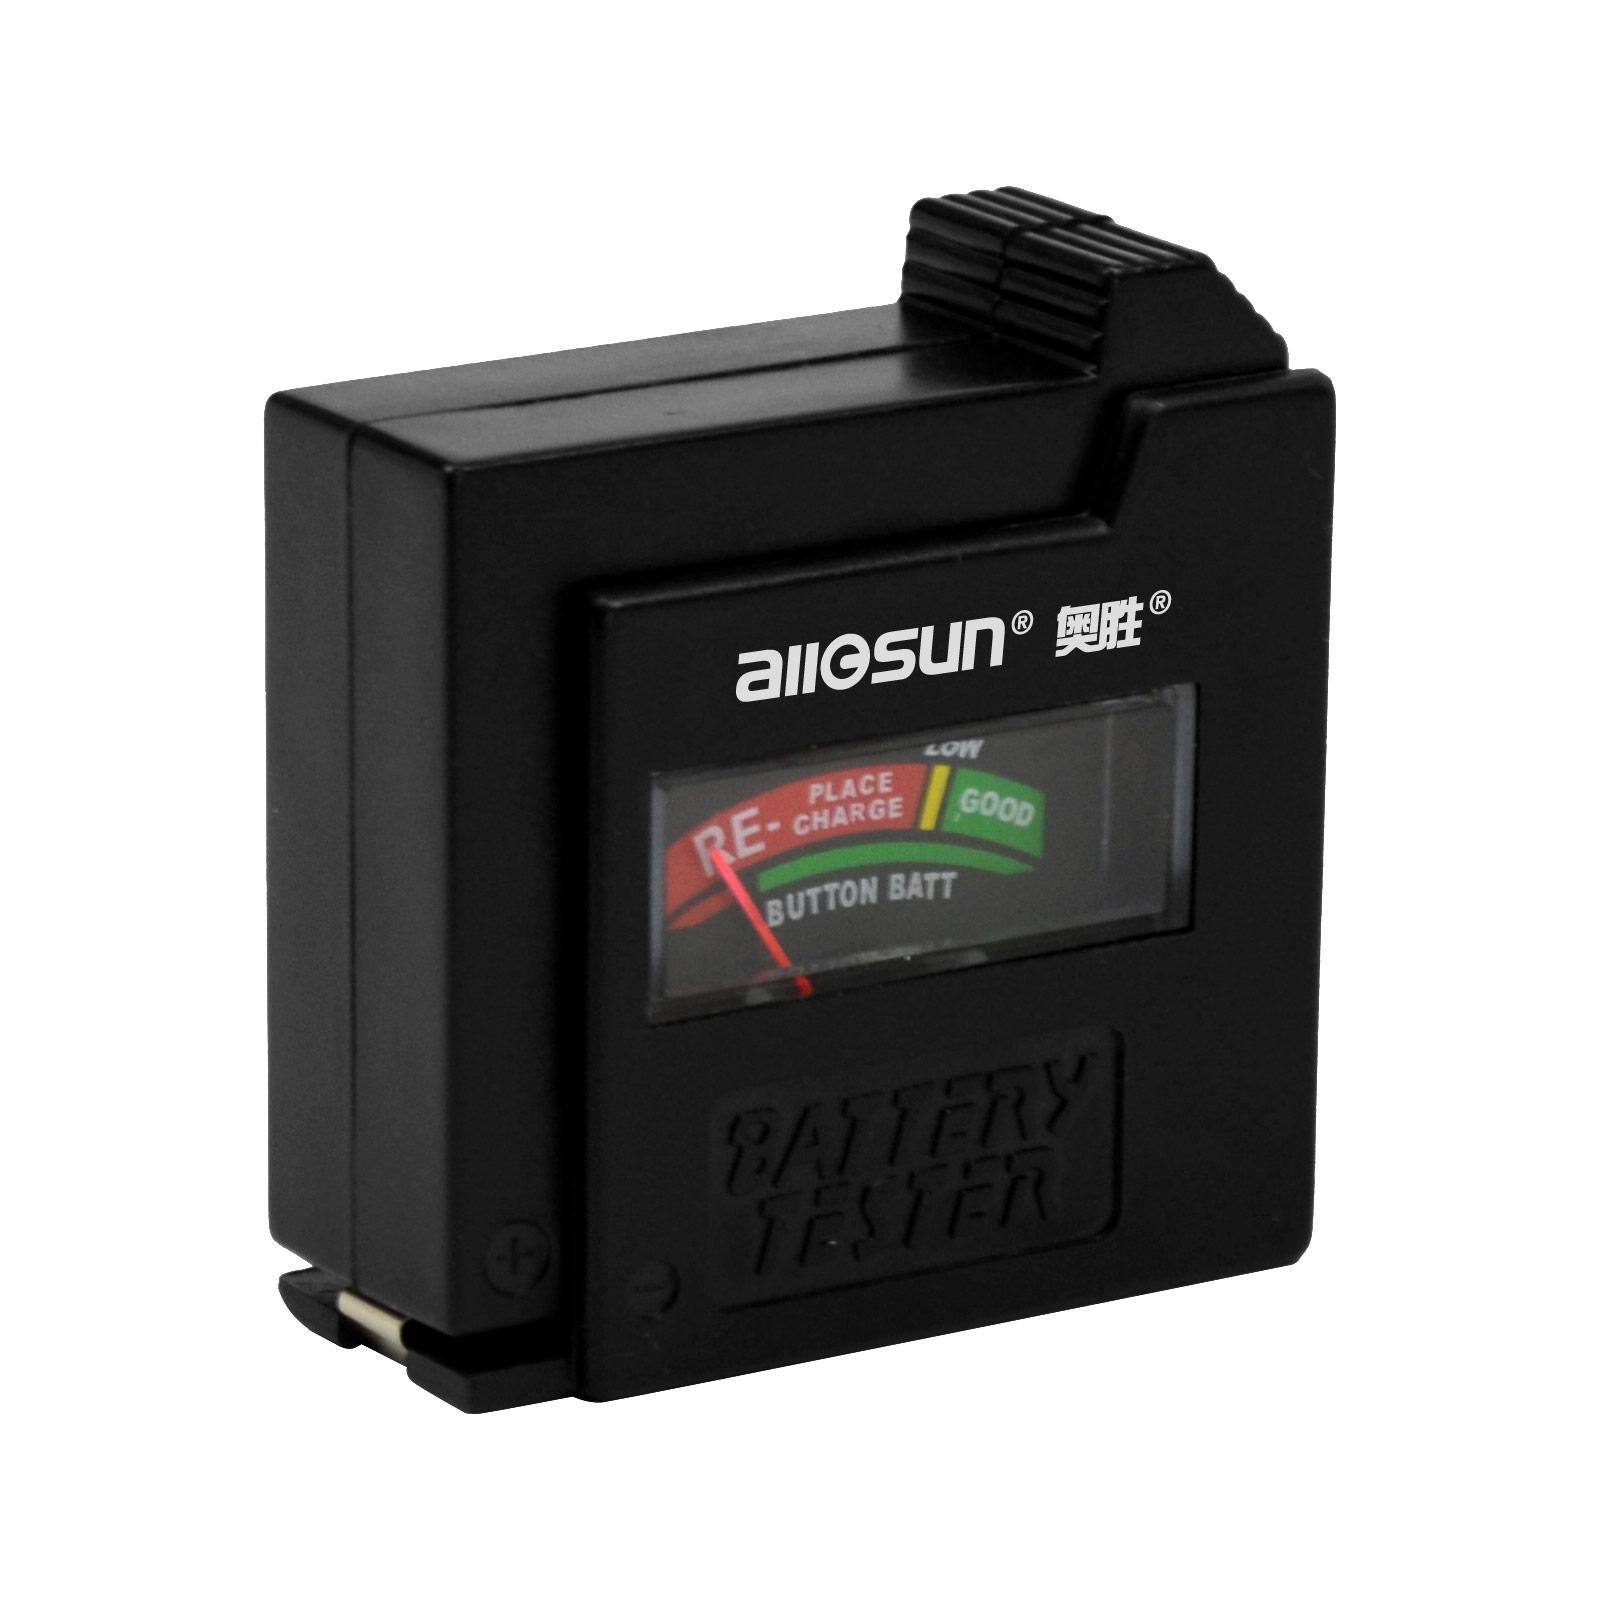 1.5 / 9V-Batterie-Tester AA / AAA / C / D-Knopfzelle Mini Taschenformat Spannungsprüfer Kostenloser Versand All Sun BT1